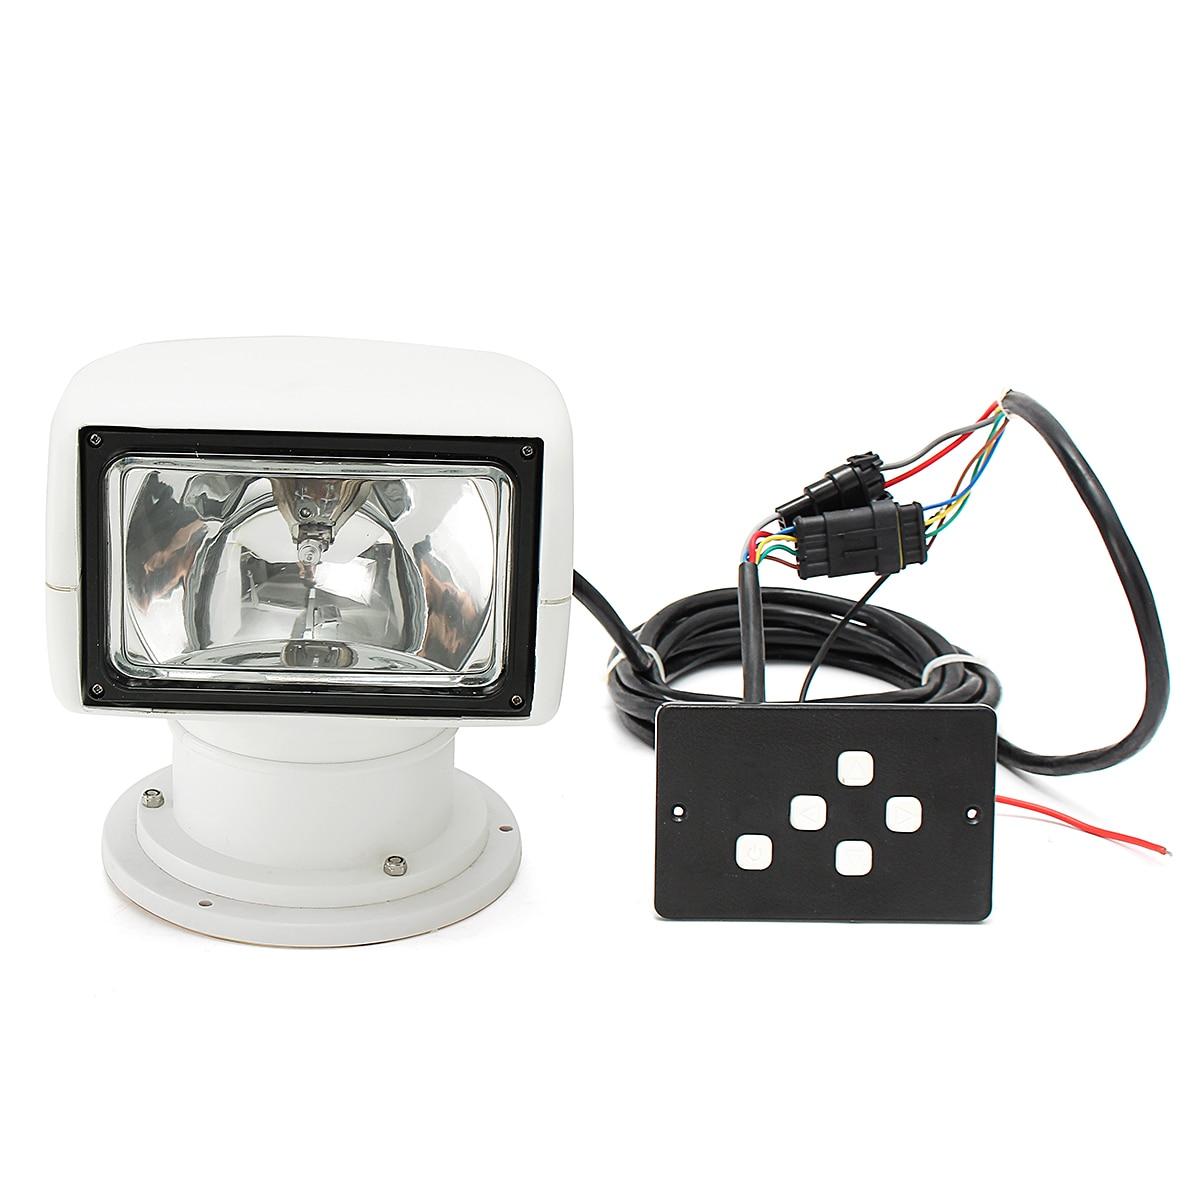 Image 2 - Smuxi Spotlight 12V 100W 2500LM 3200K Marine Searchlight Light Bulb PC+Aluminum Remote Control Multi angled White-in LED Spotlights from Lights & Lighting